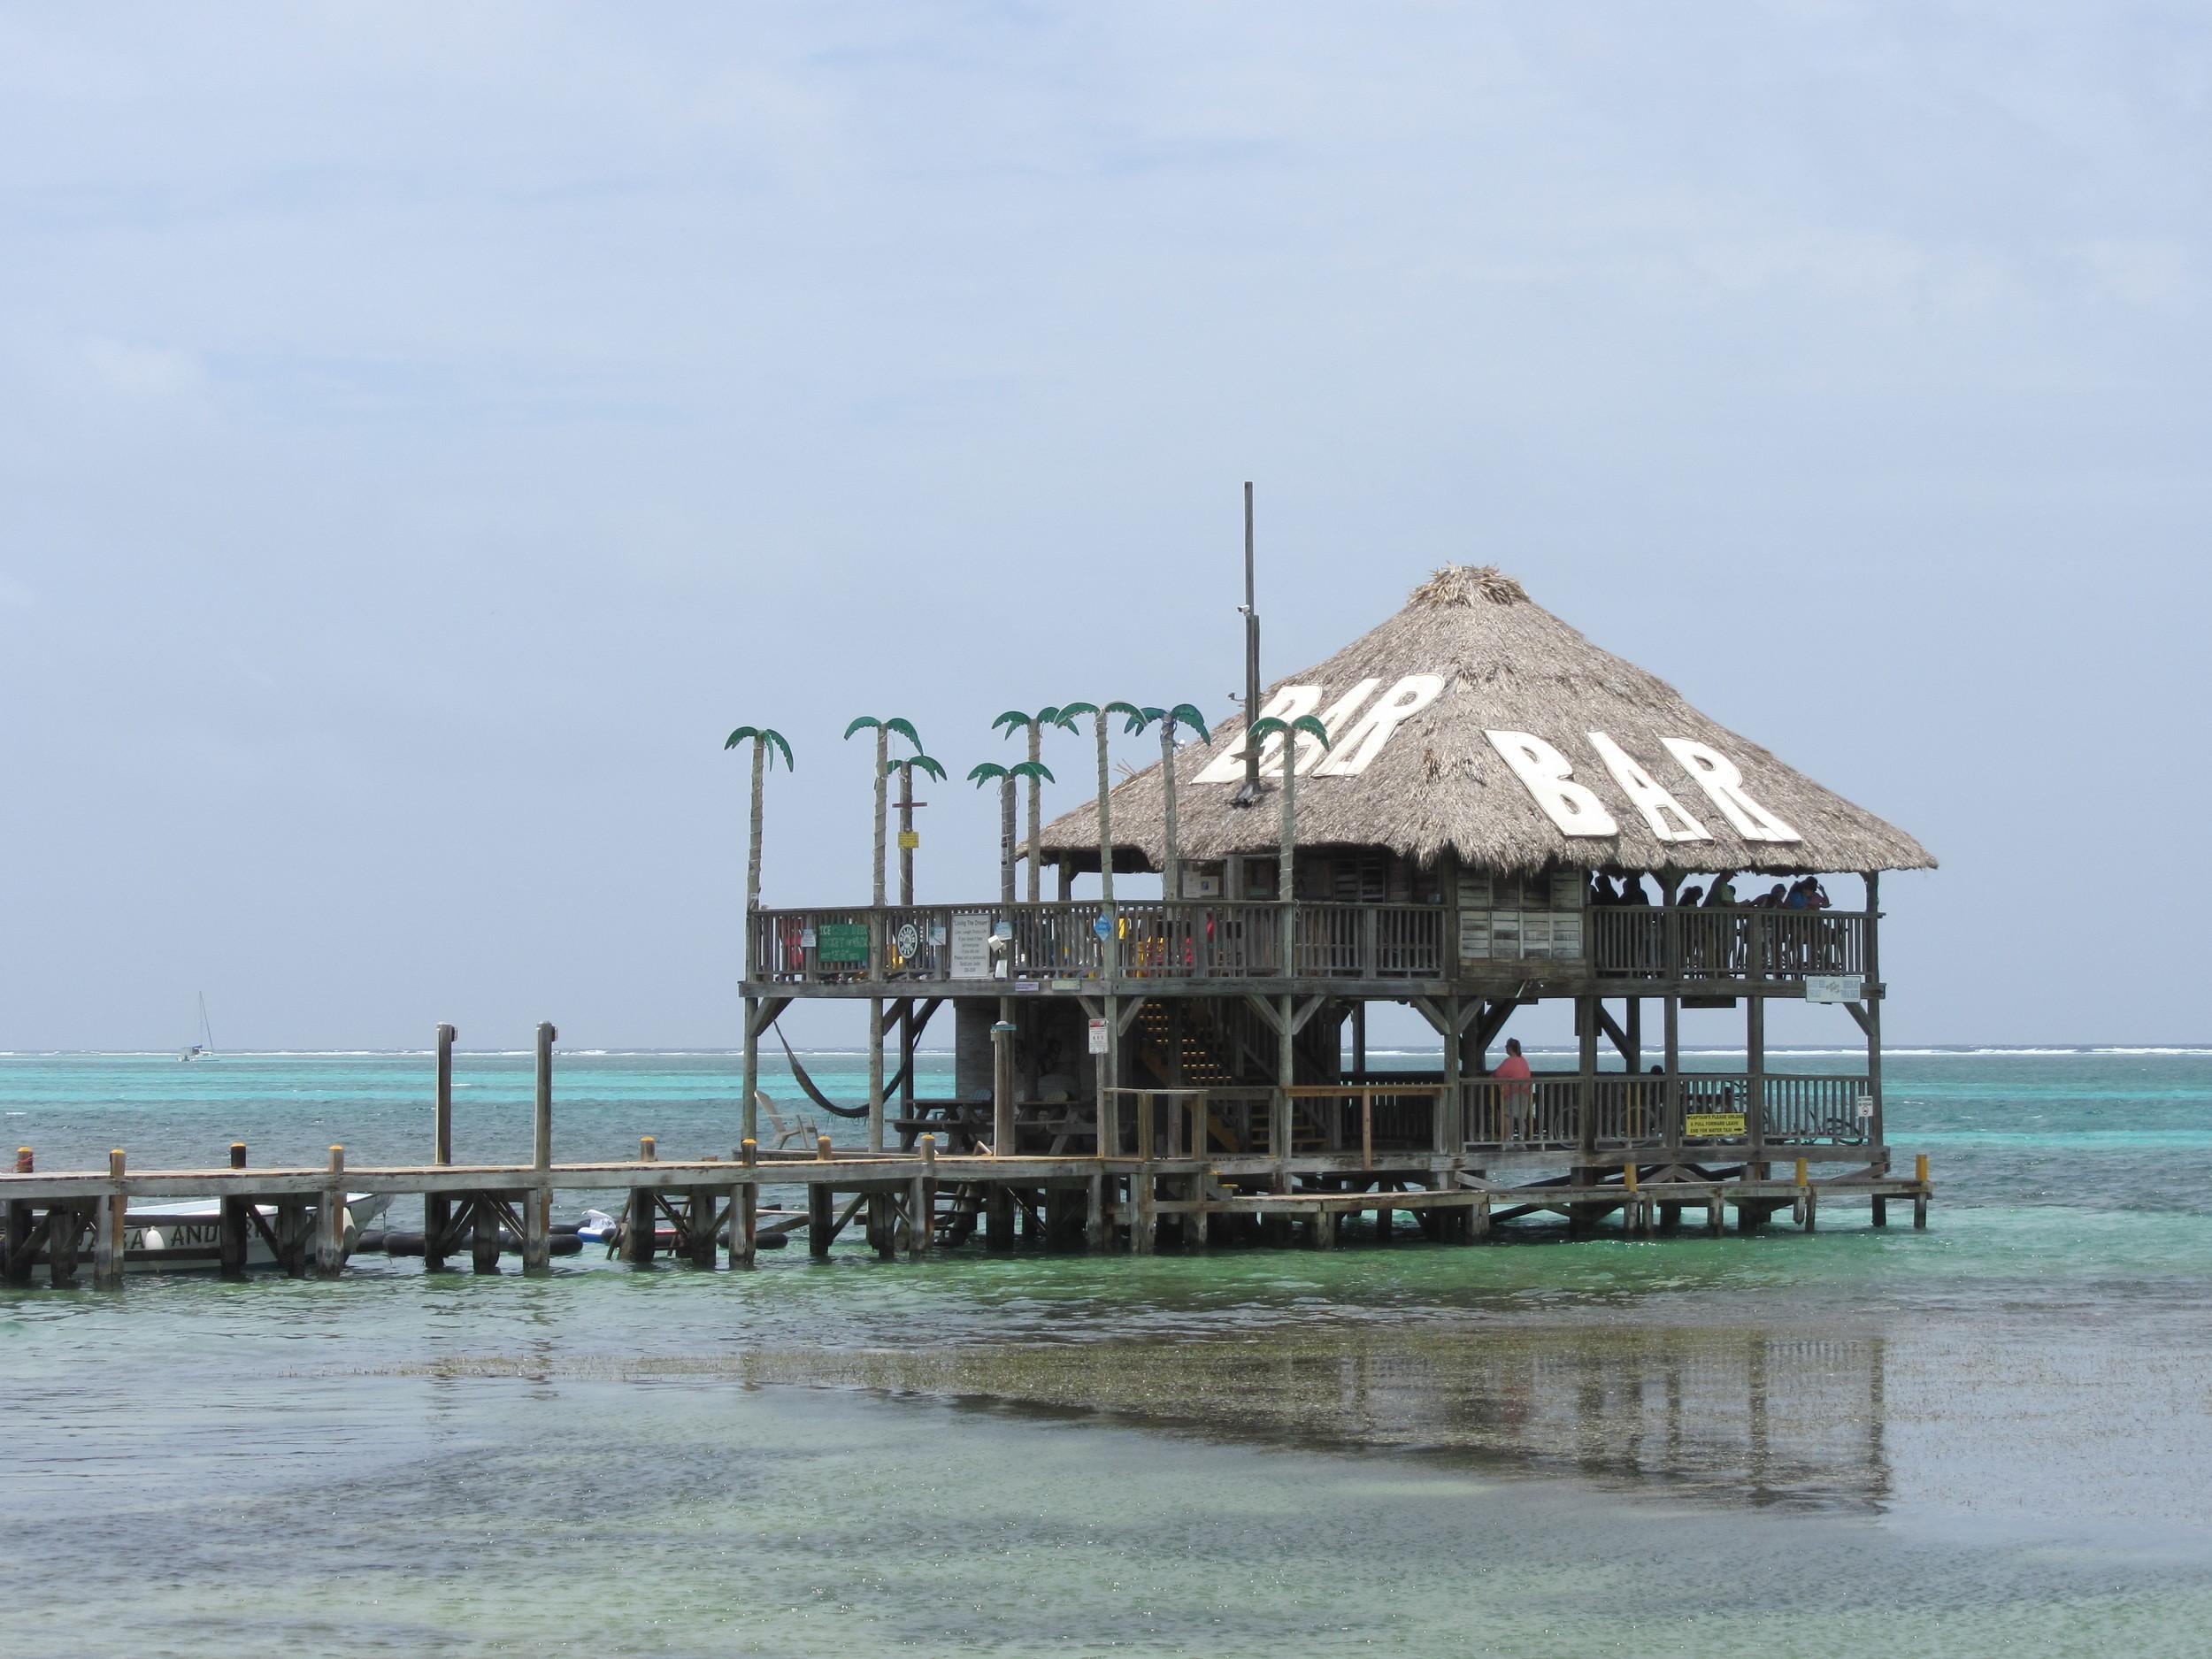 Palapa Bar & Grill, Belize